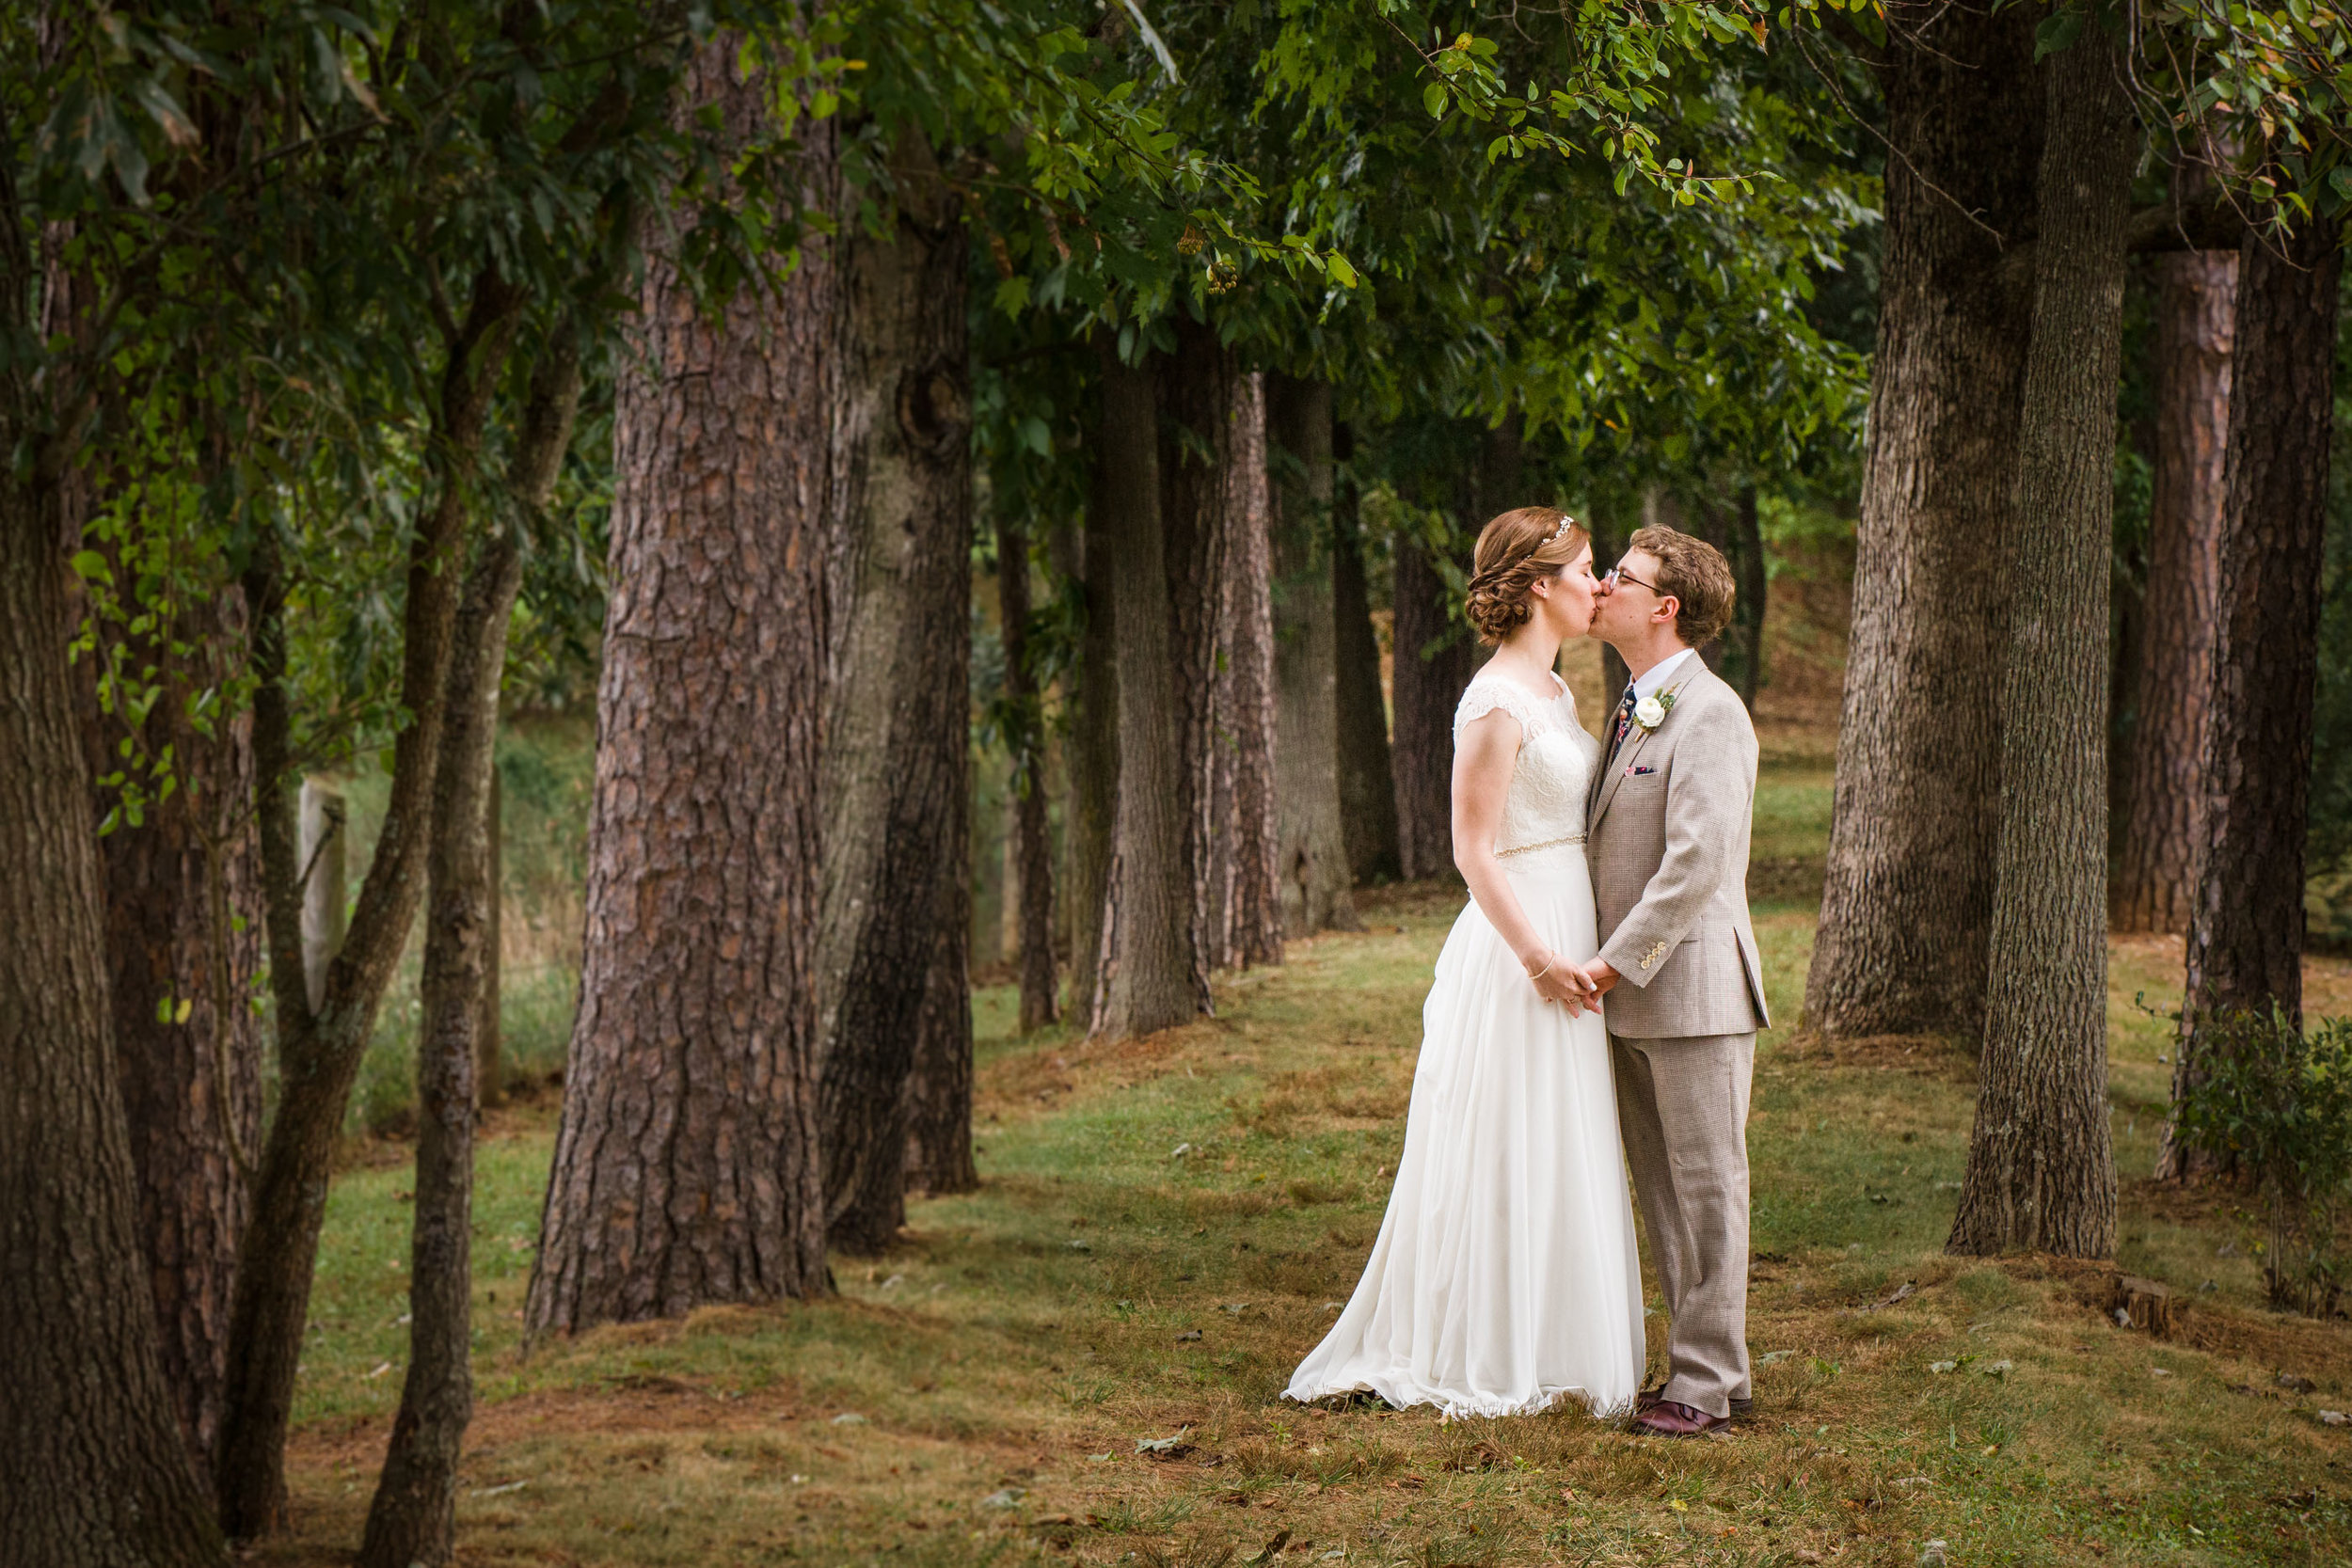 2018_09_15_paul_mary_wedding_asheville-1619.jpg